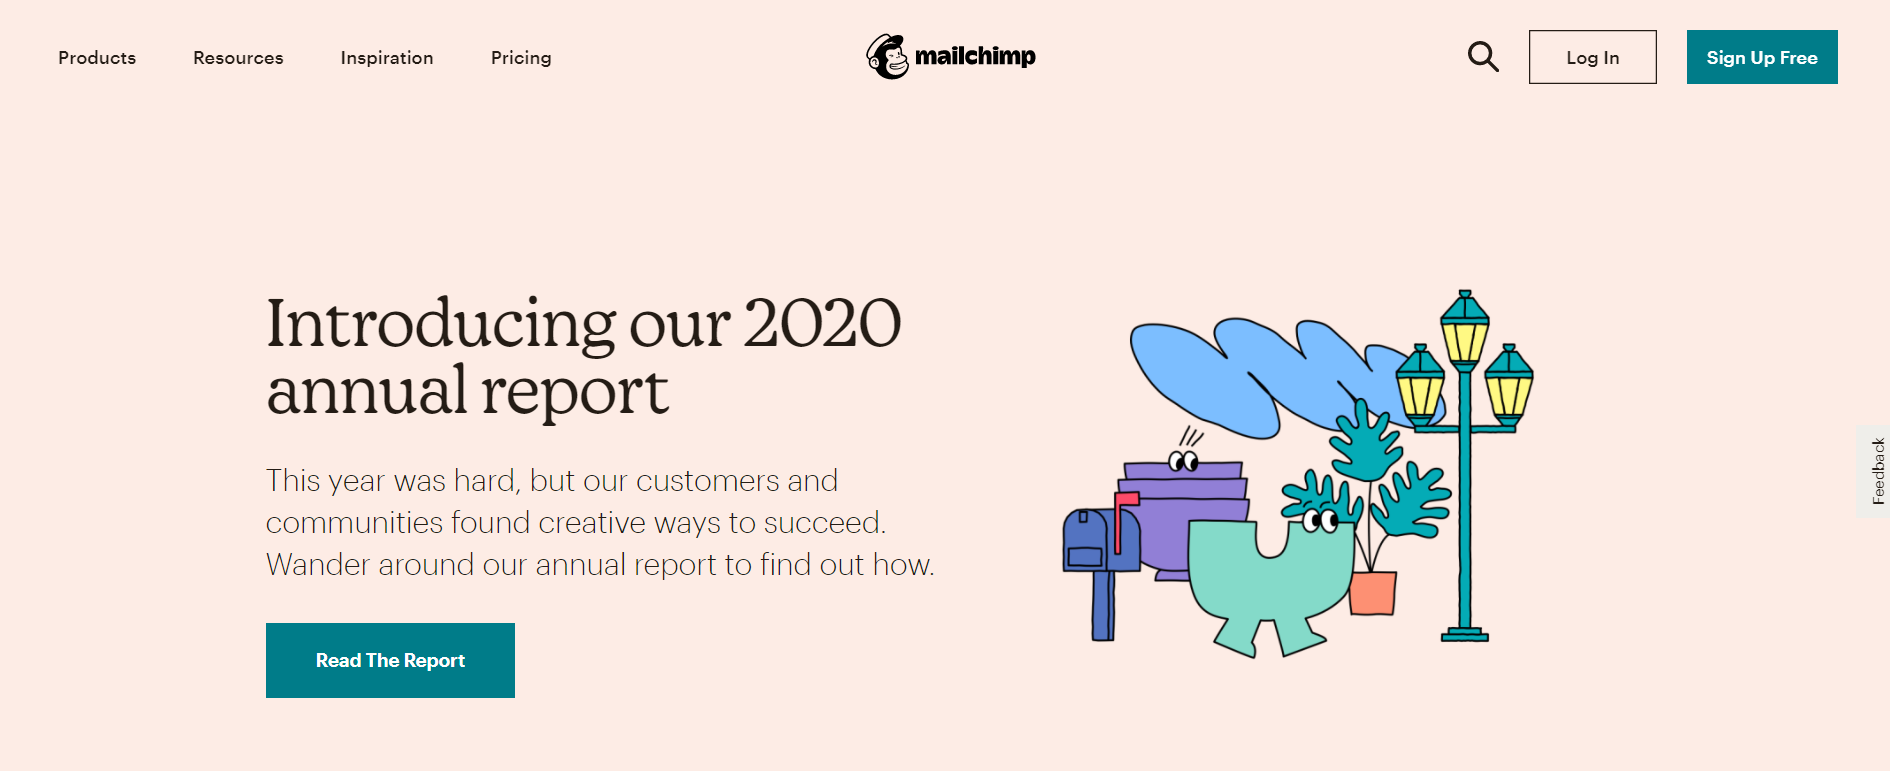 Mailchimp-Overview